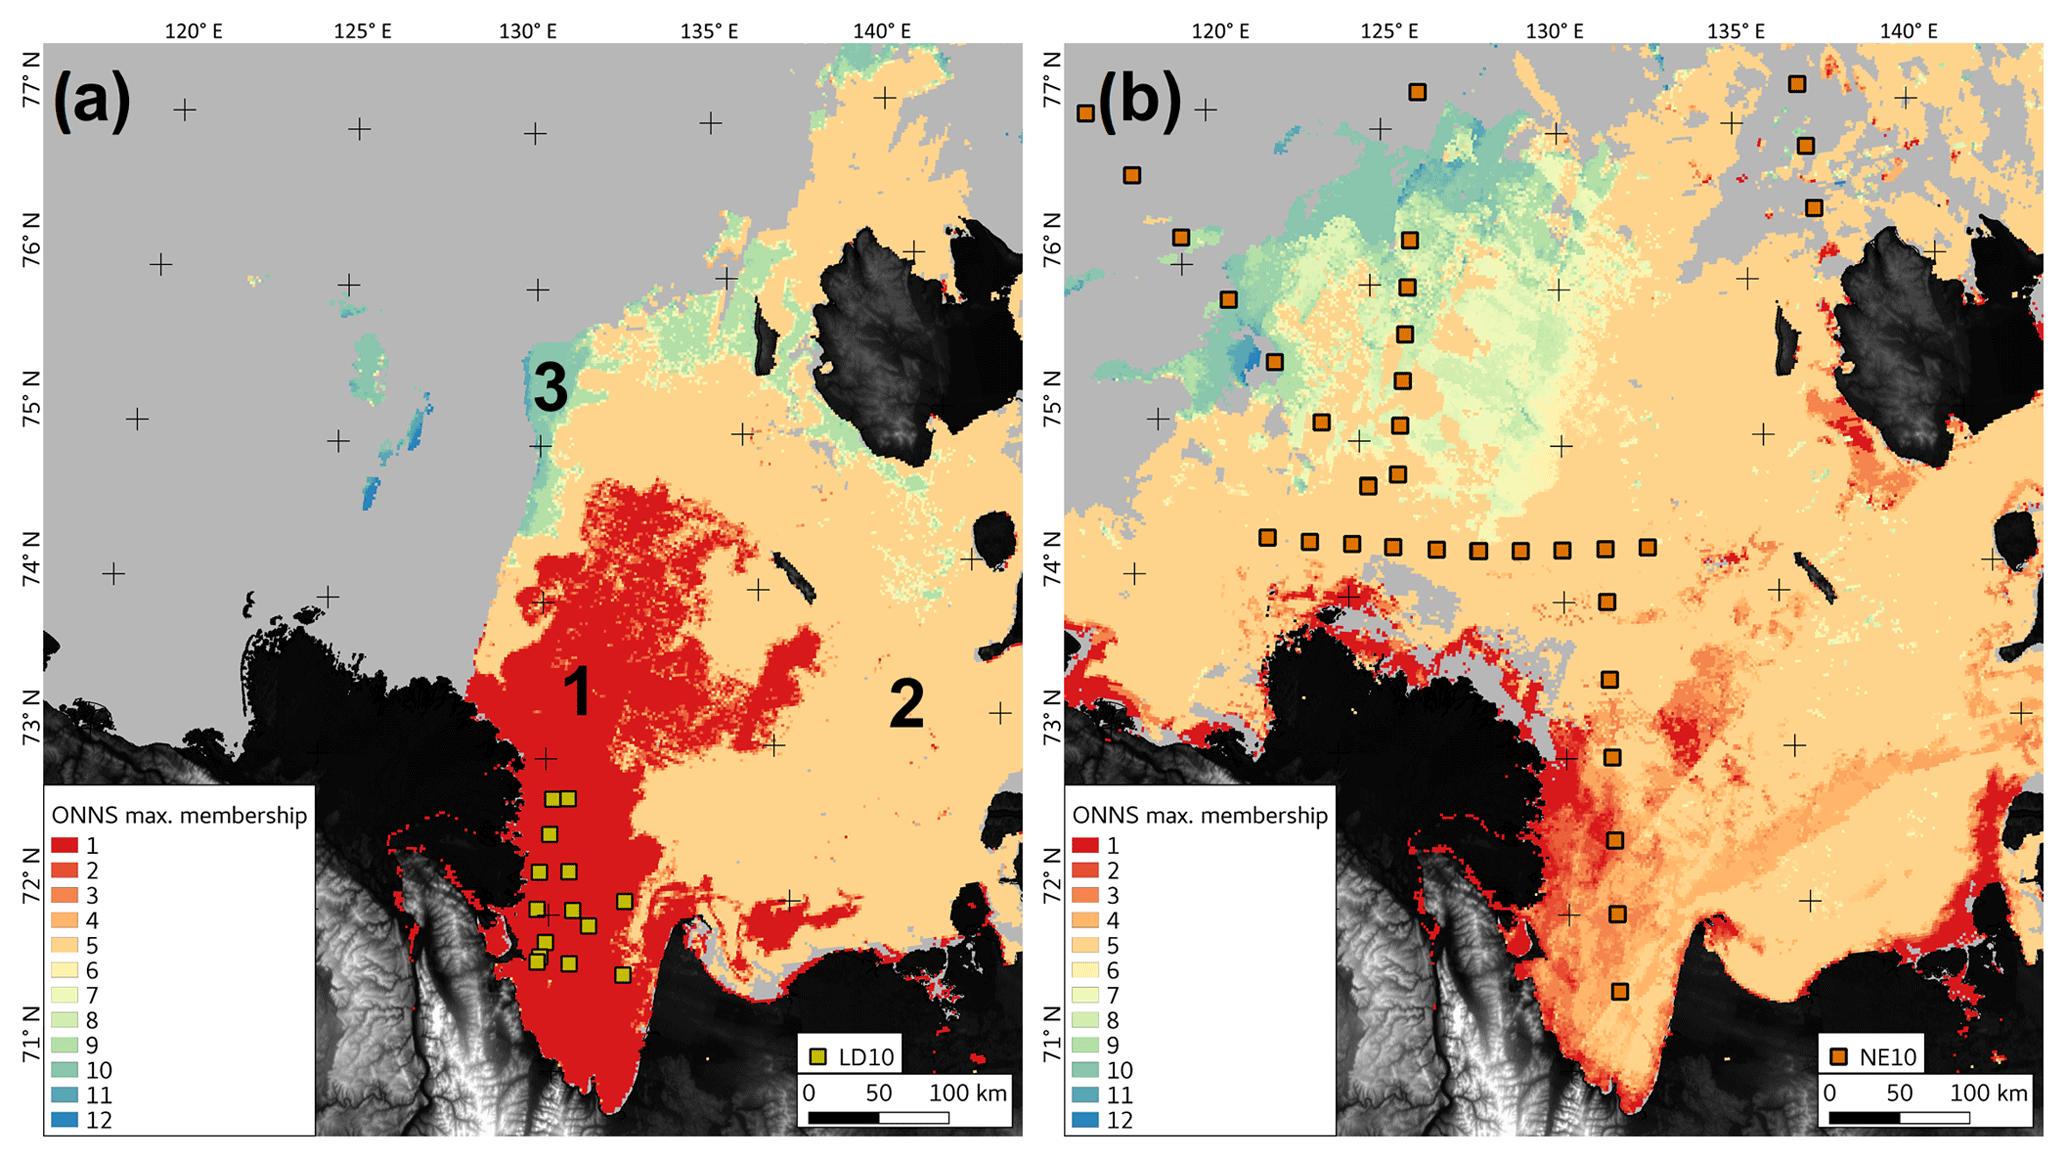 BG - Dissolved organic matter at the fluvial–marine